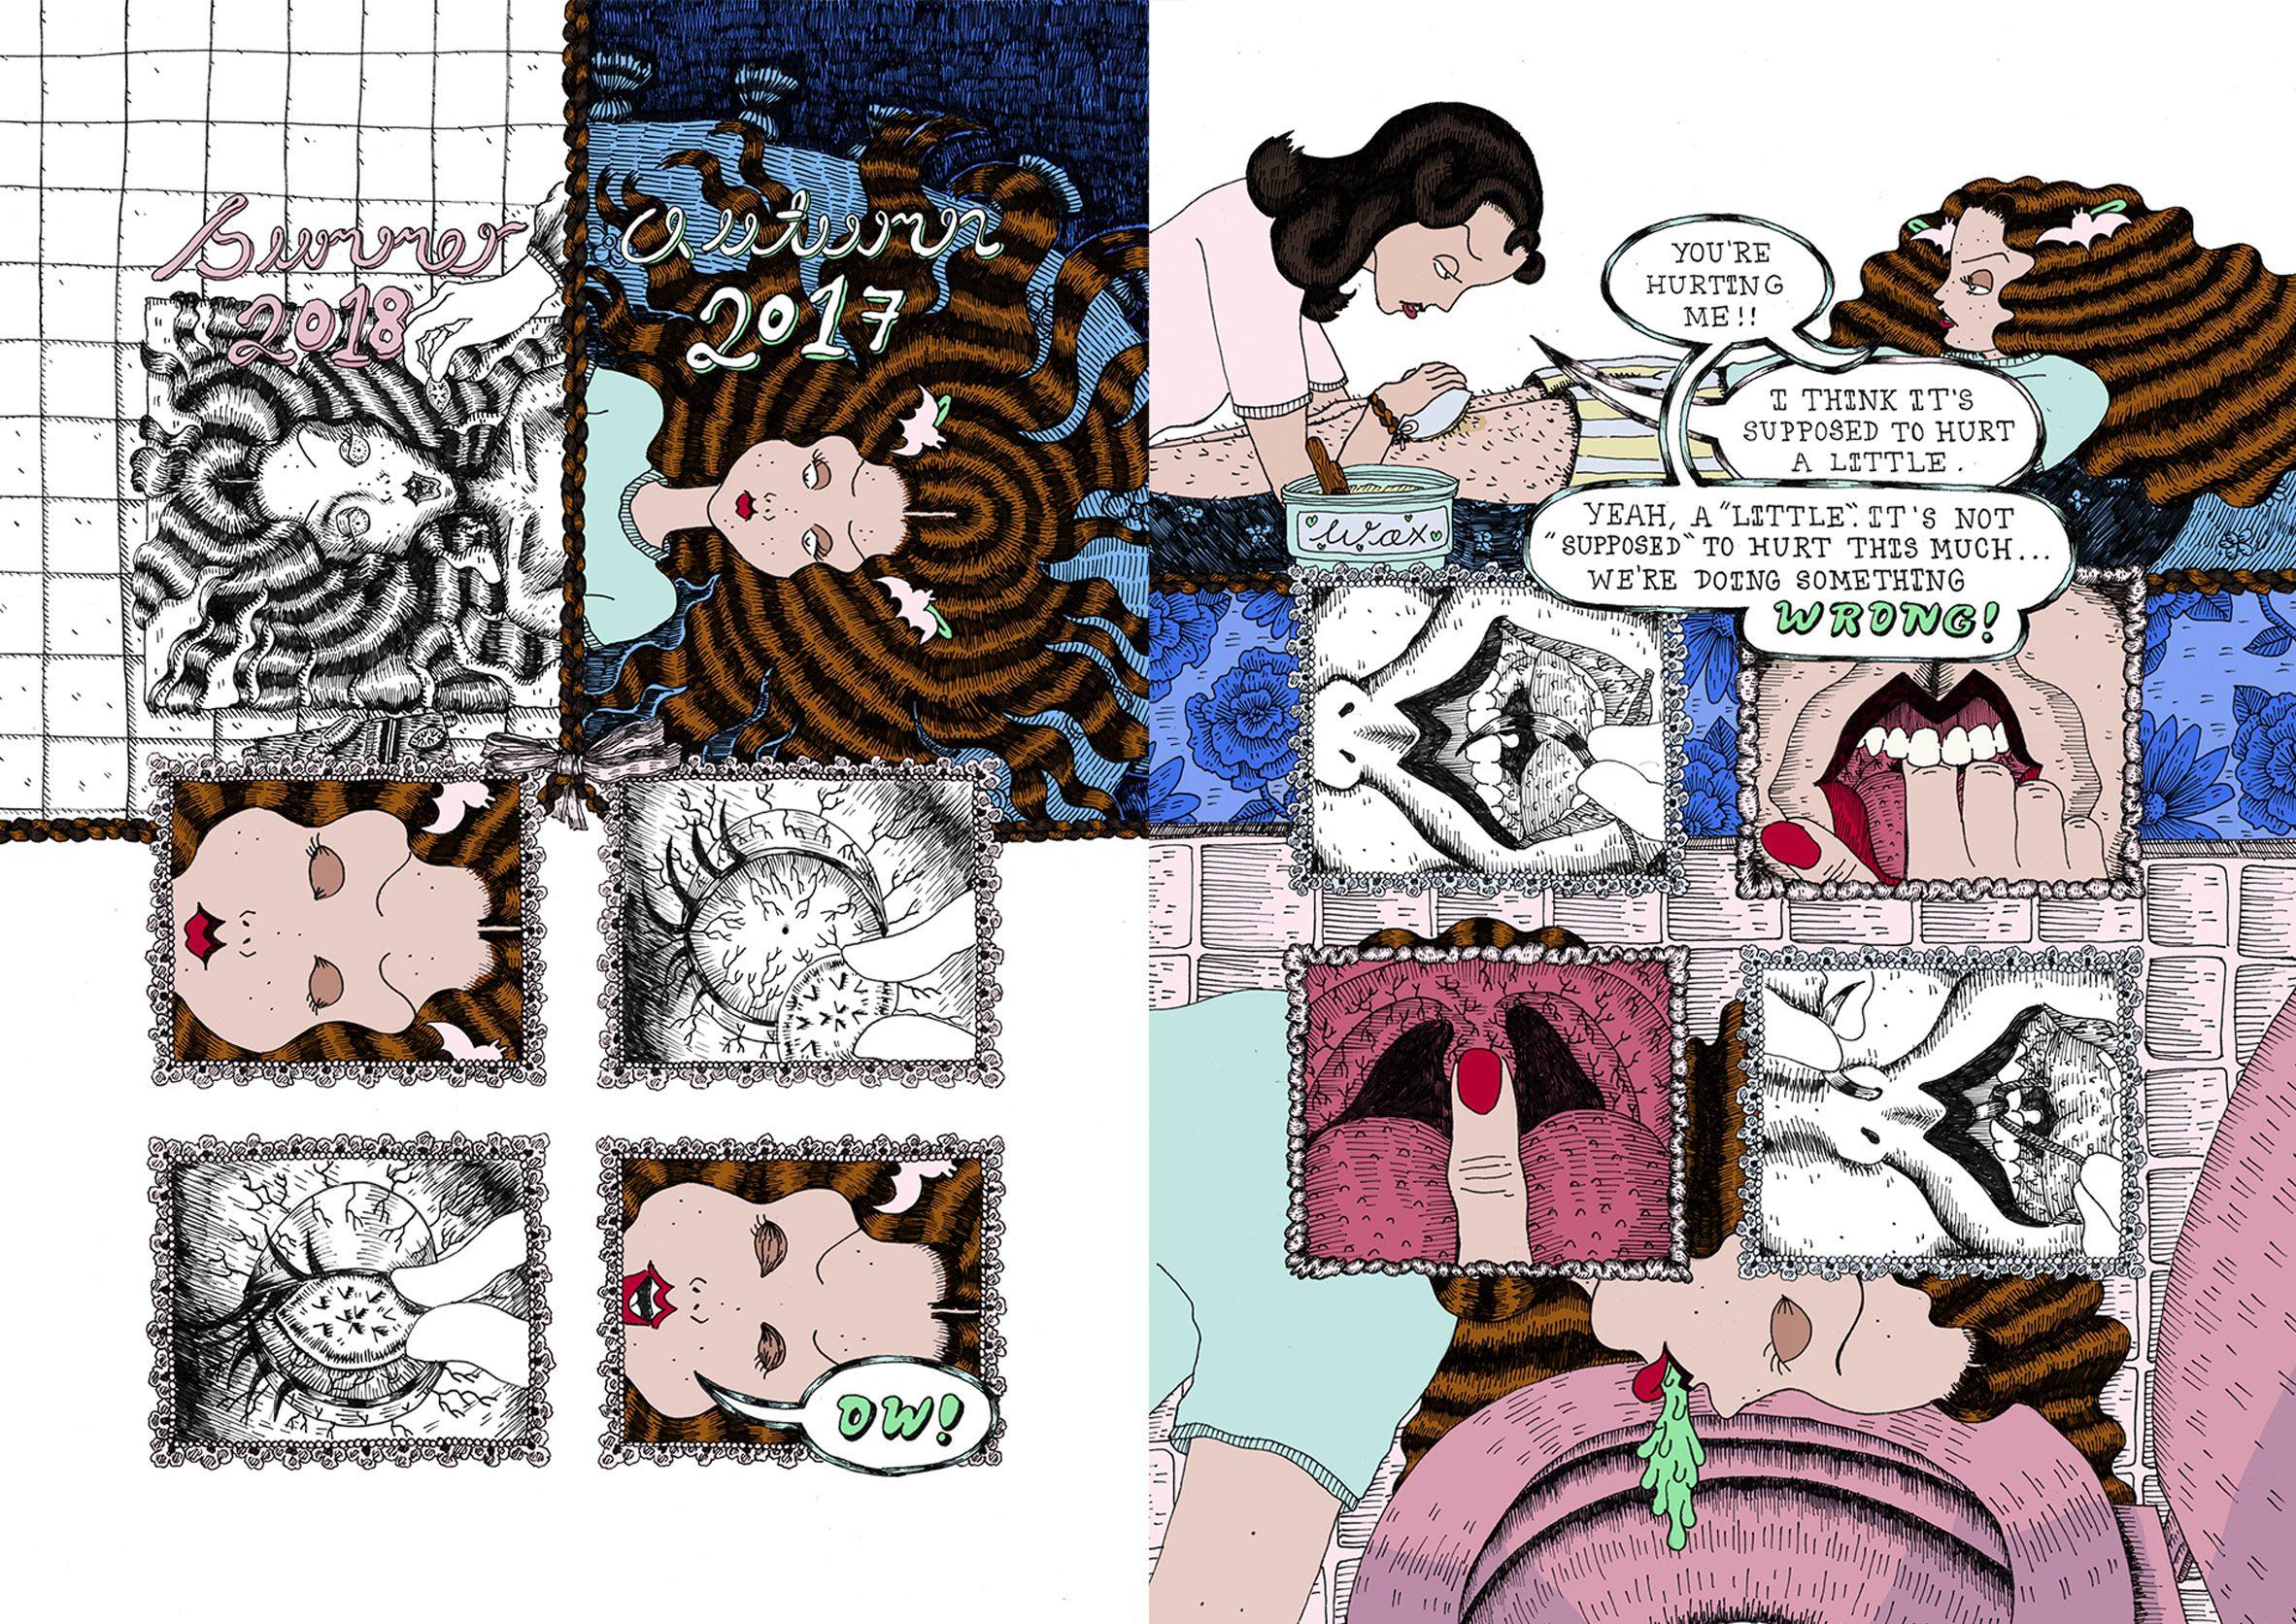 University for the Creative Arts illustration school show